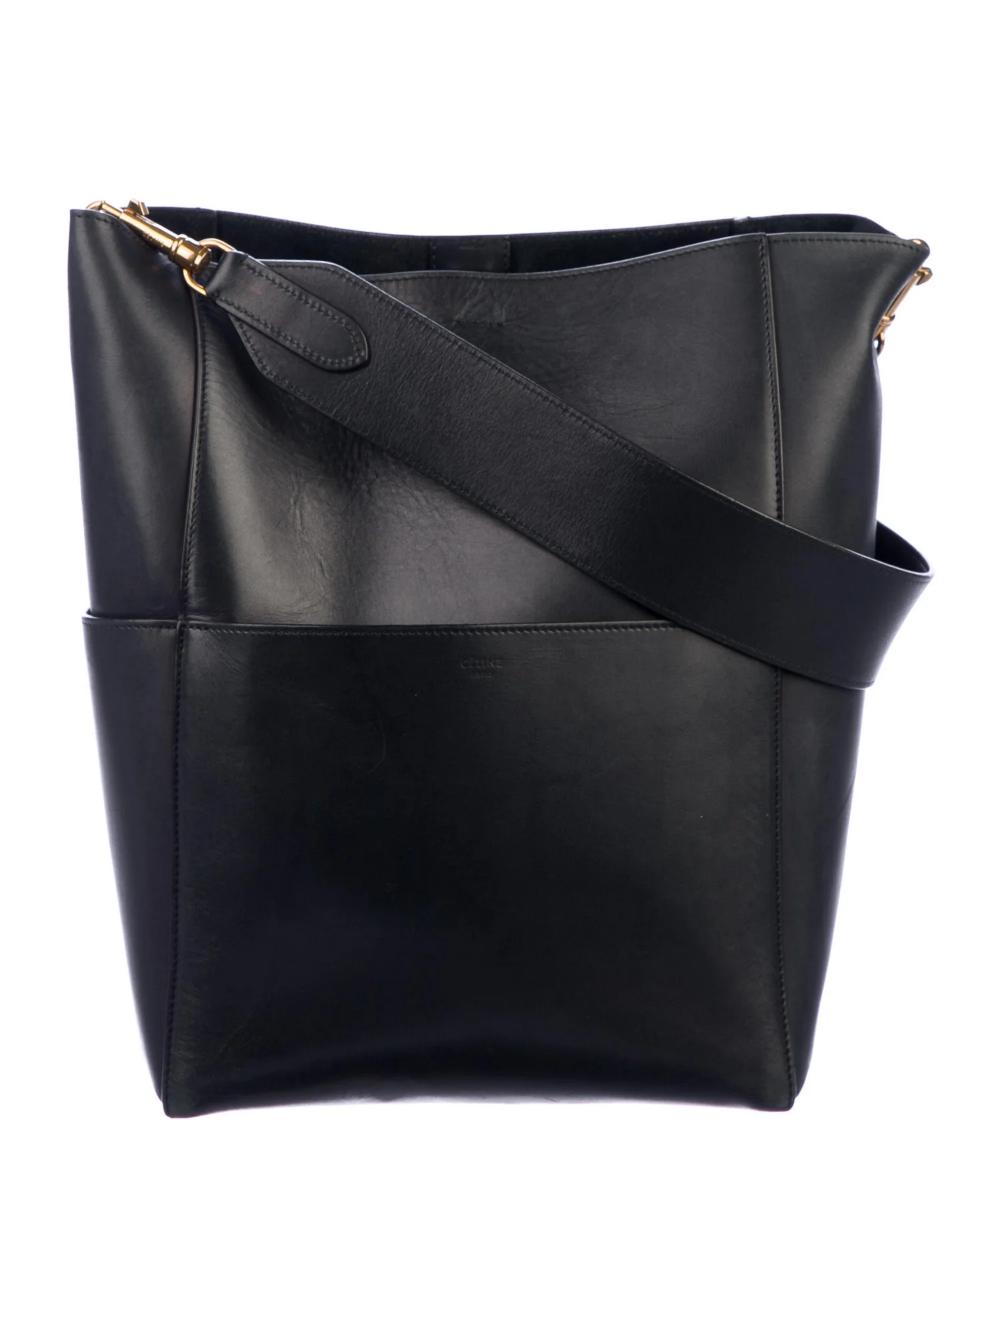 Celine Seau Sangle Bag - Handbags - CEL131848 | The RealReal